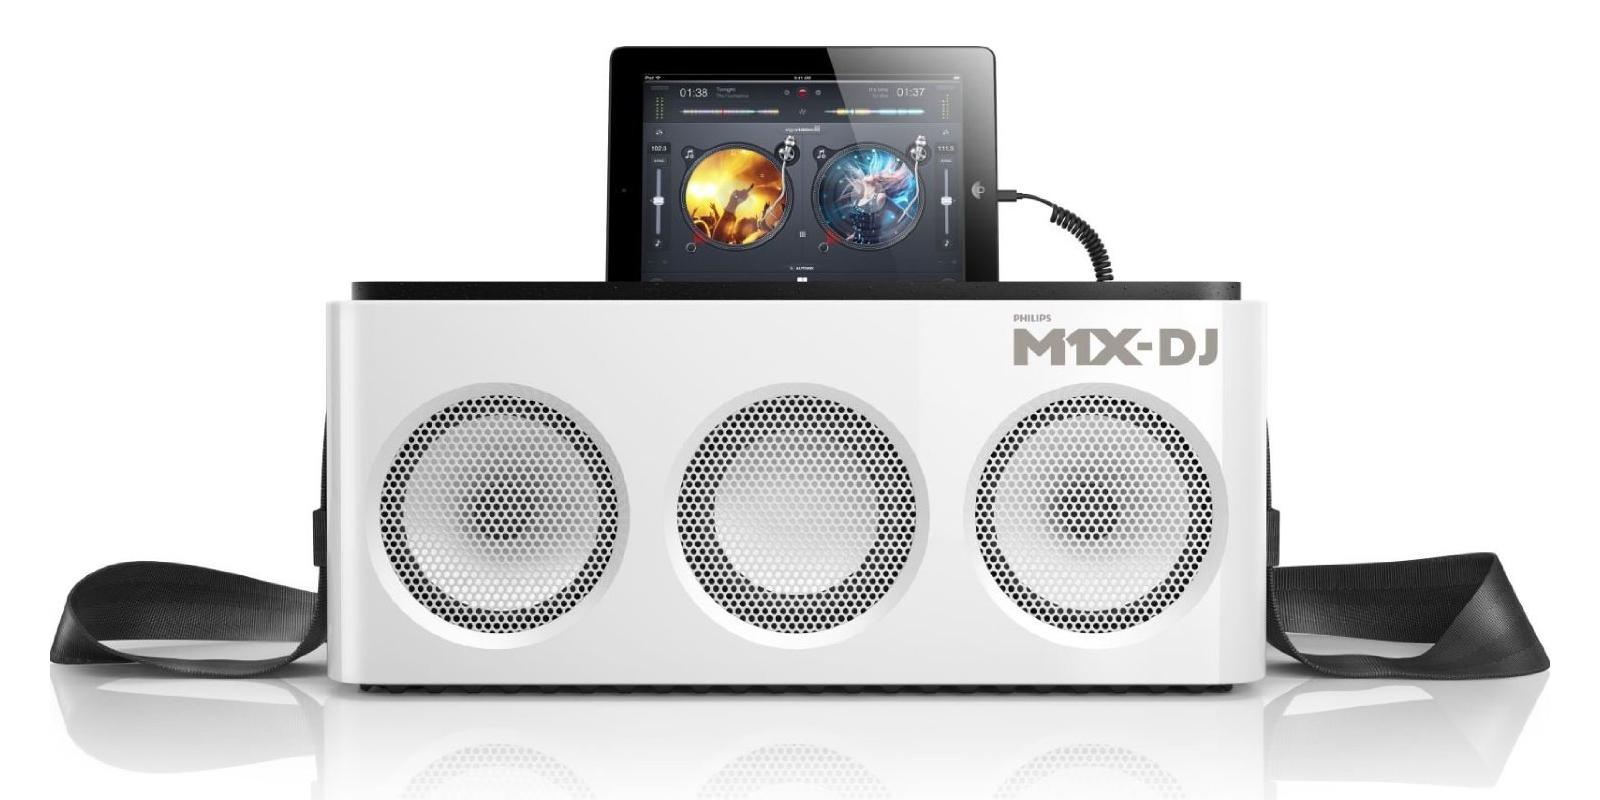 37-M1X-DJ-Sound-System-Docking-Station1